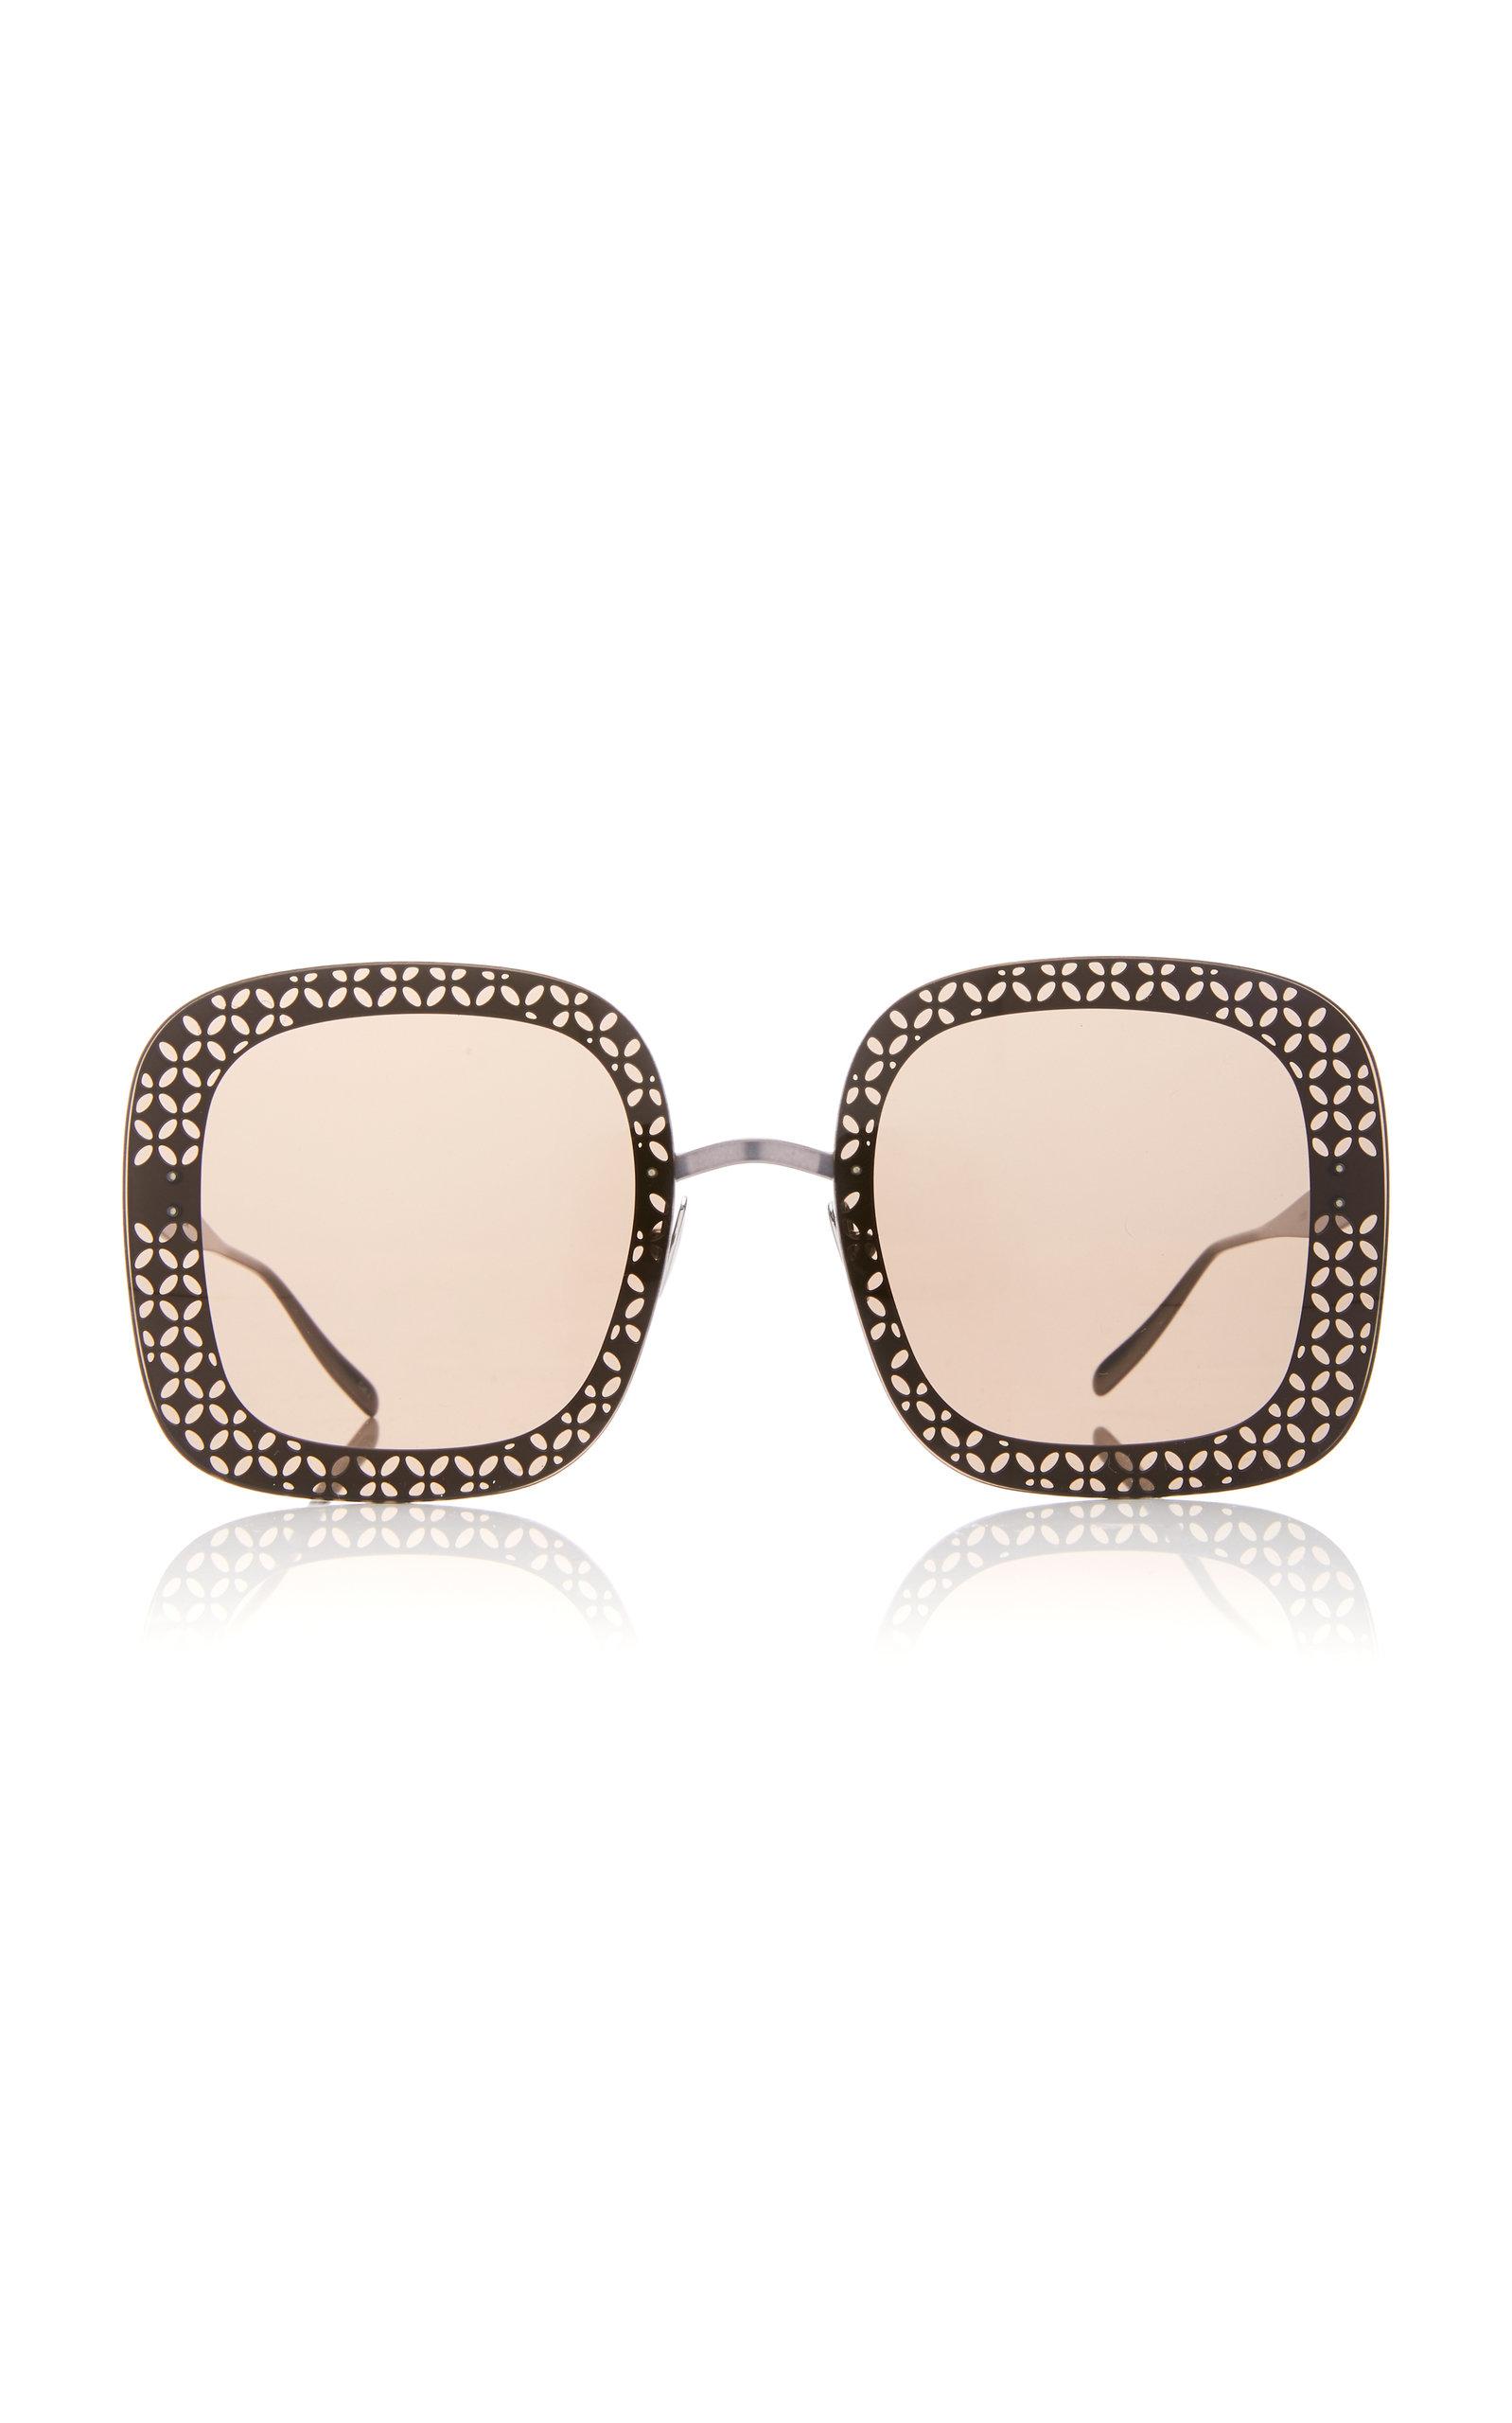 ALAIA SUNGLASSES Le Petale Sunglasses in Brown